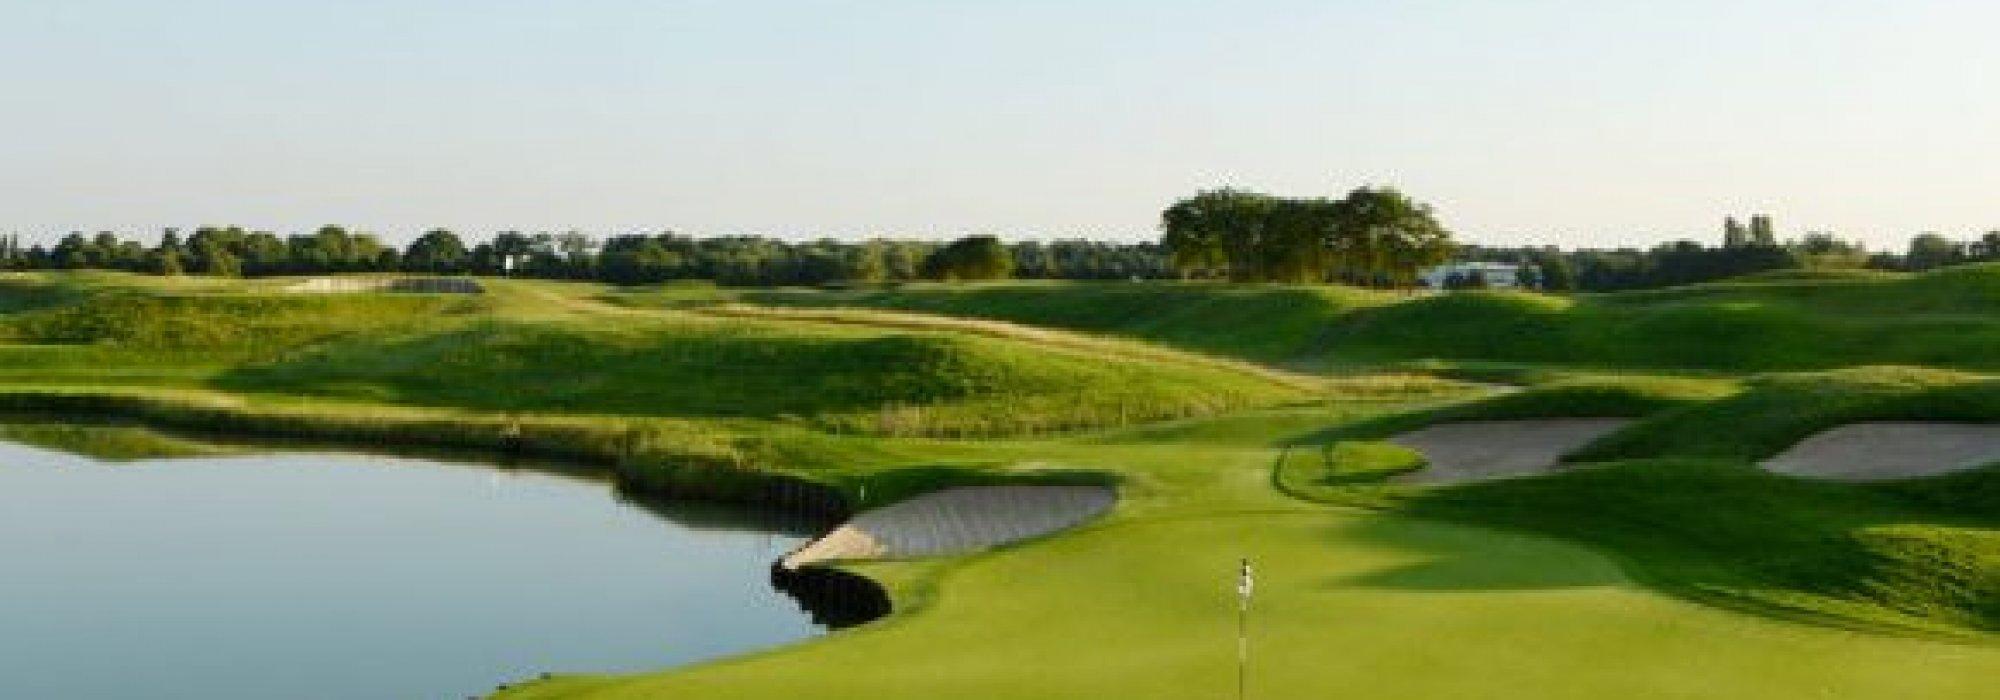 golf-national-trou-16-1024x378